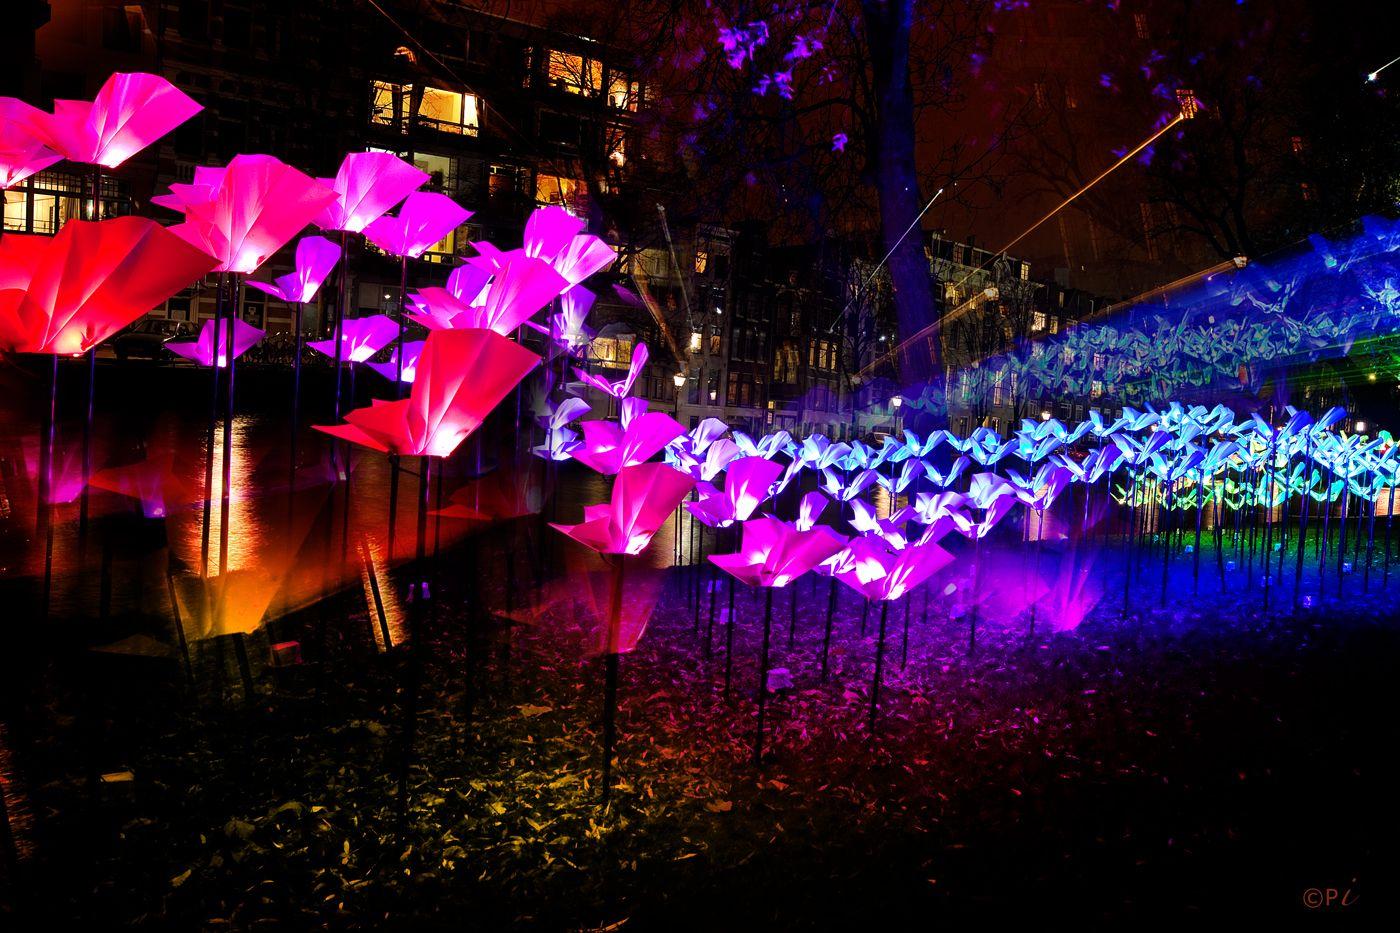 Amsterdam Light Festival 2014 Wings of Freedom